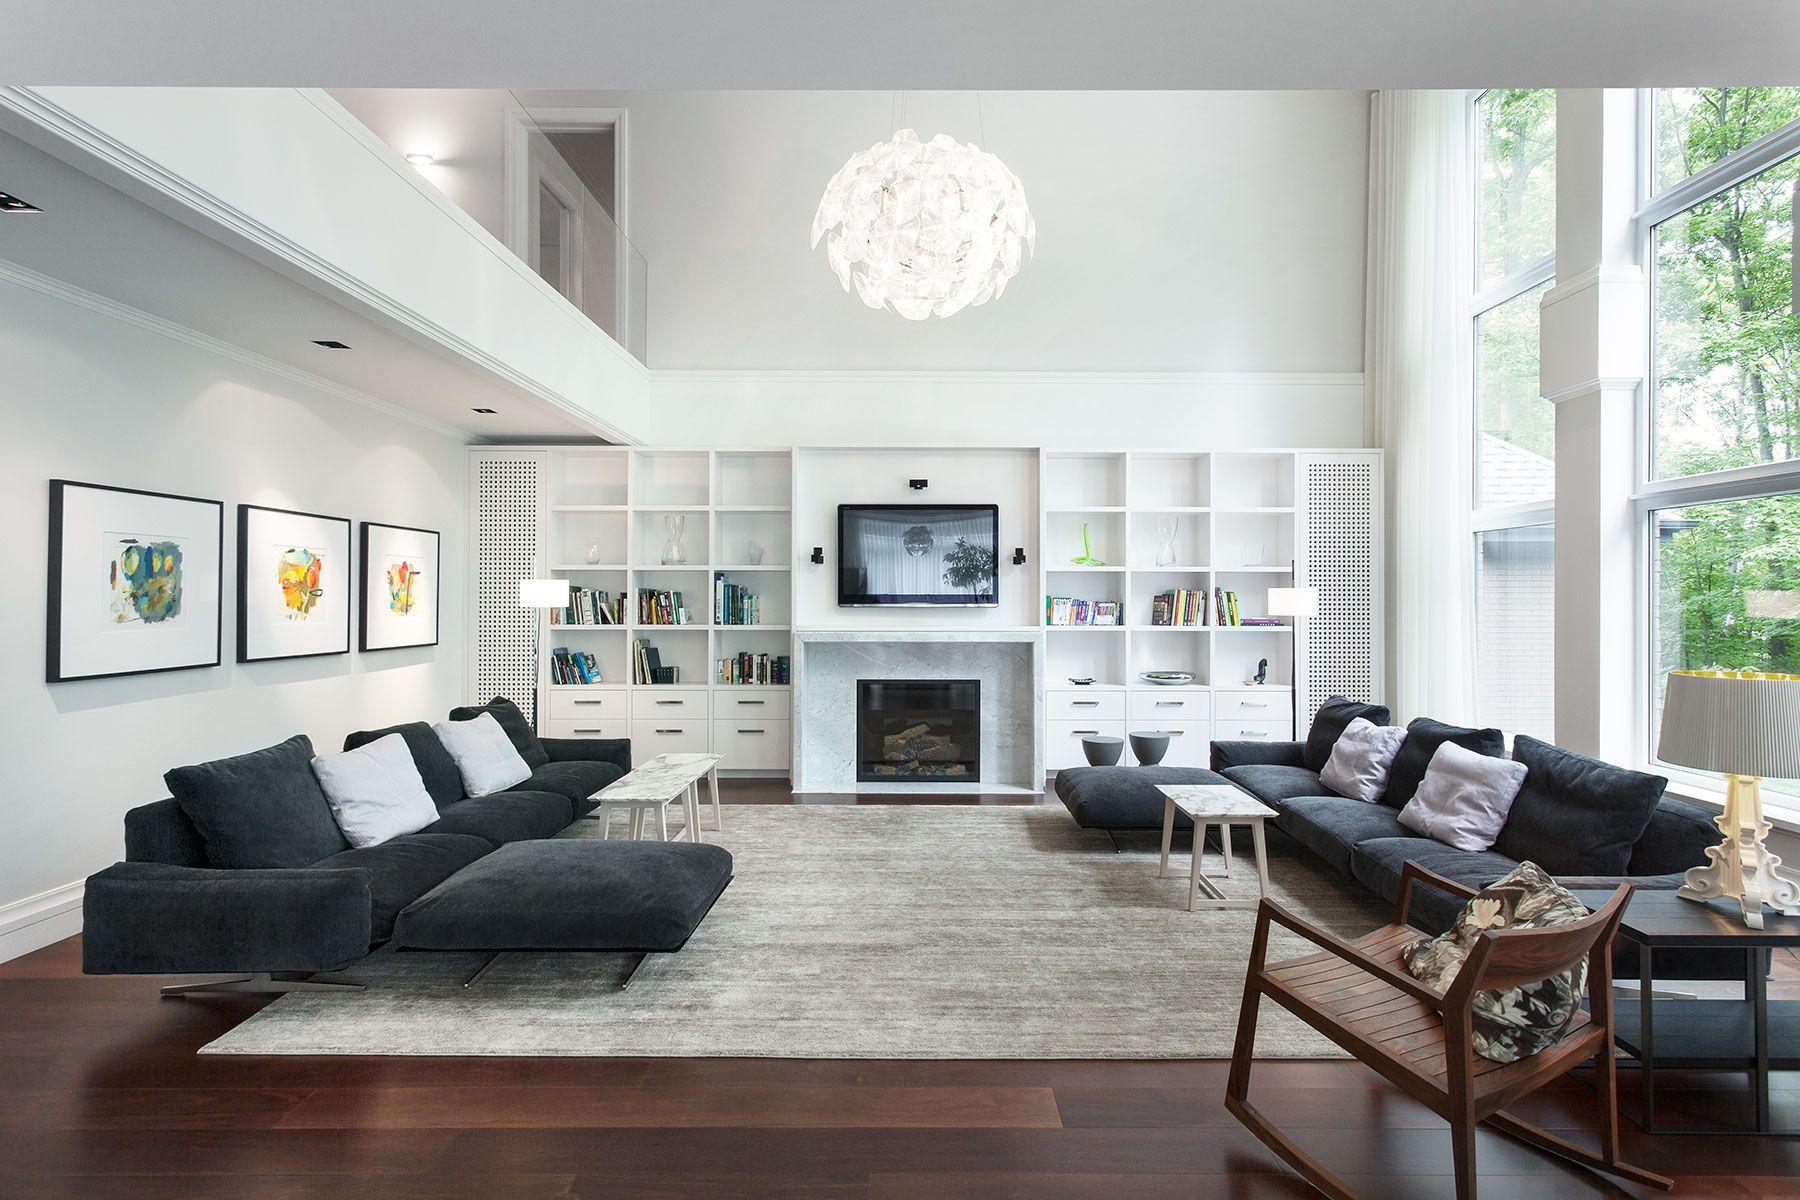 Sophisticated modern living room decorating ideas plus smart target ...